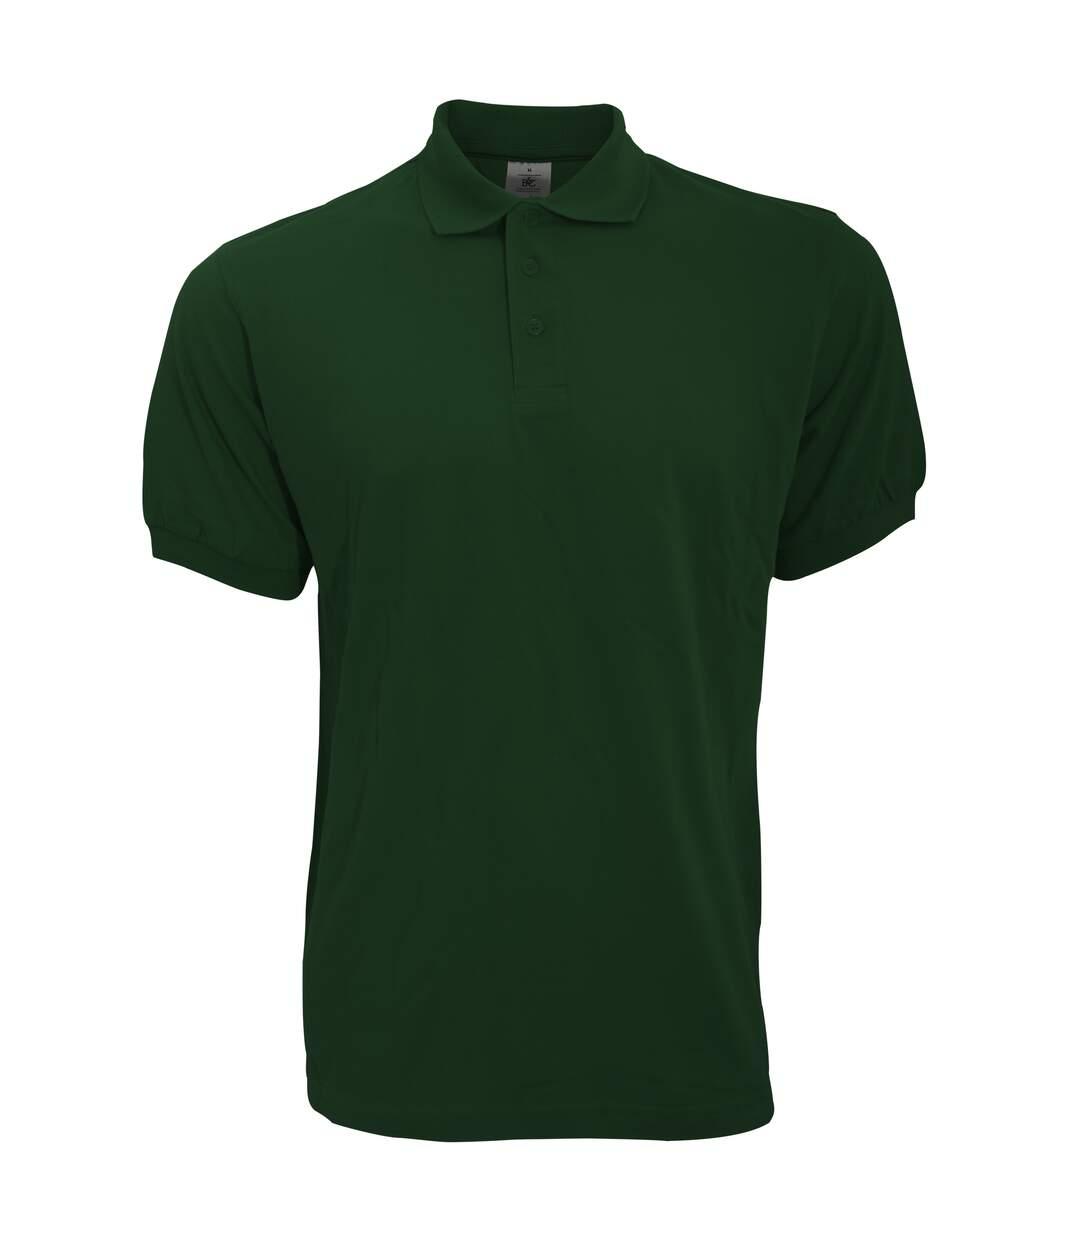 B&C Safran Mens Polo Shirt / Mens Short Sleeve Polo Shirts (Bottle Green) - UTBC103